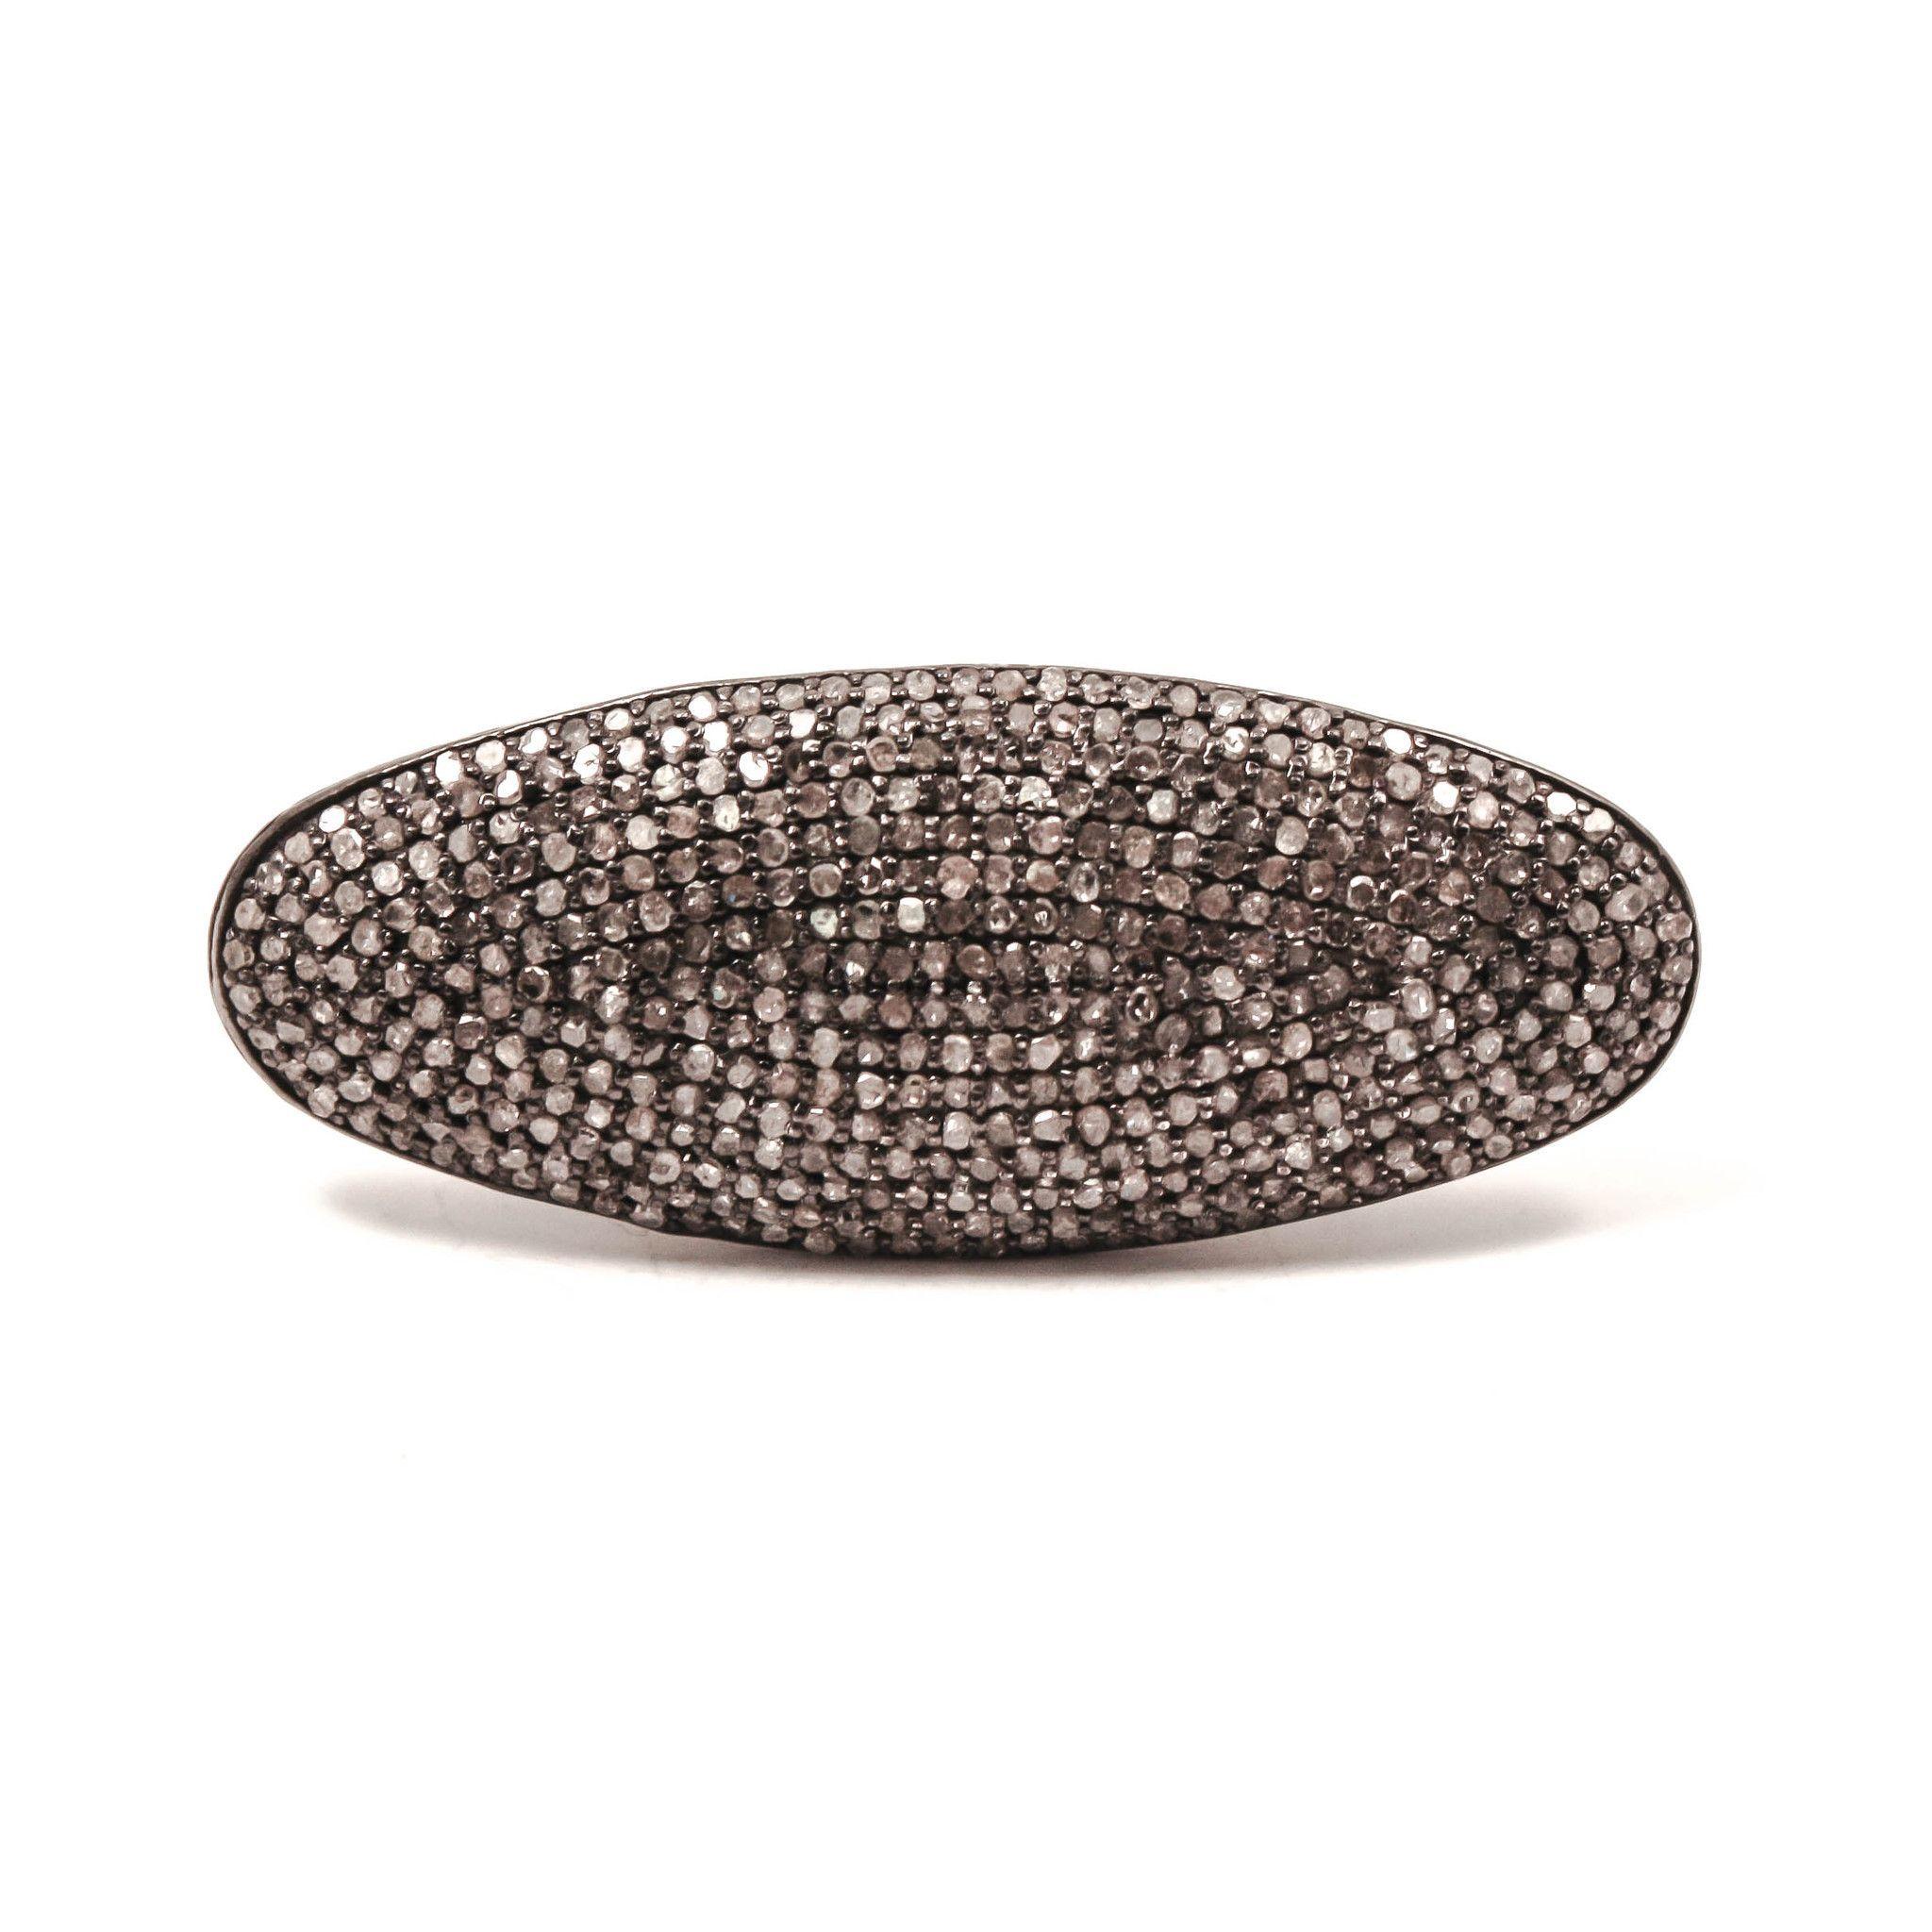 Alixandra Collections Horizontal Oval Diamond Ring